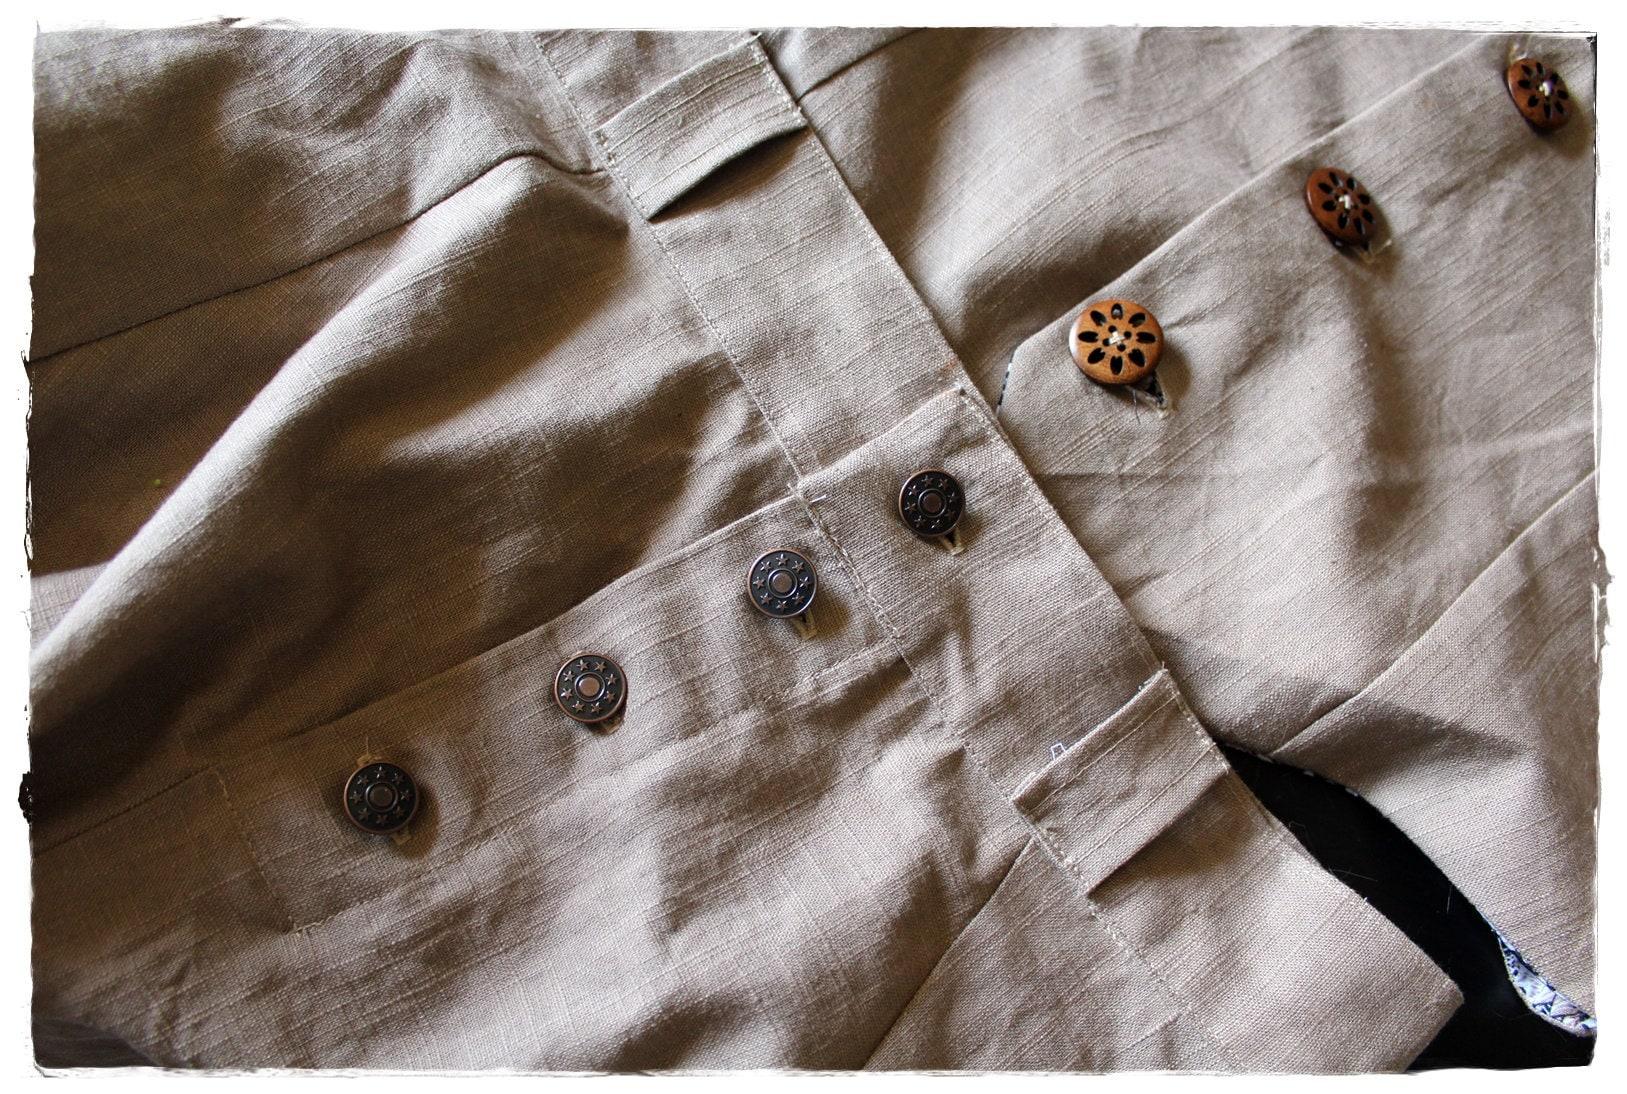 Costume homme en lin, le gilet et le sarouel - Mens costume in linen, waistcoat and sarouel